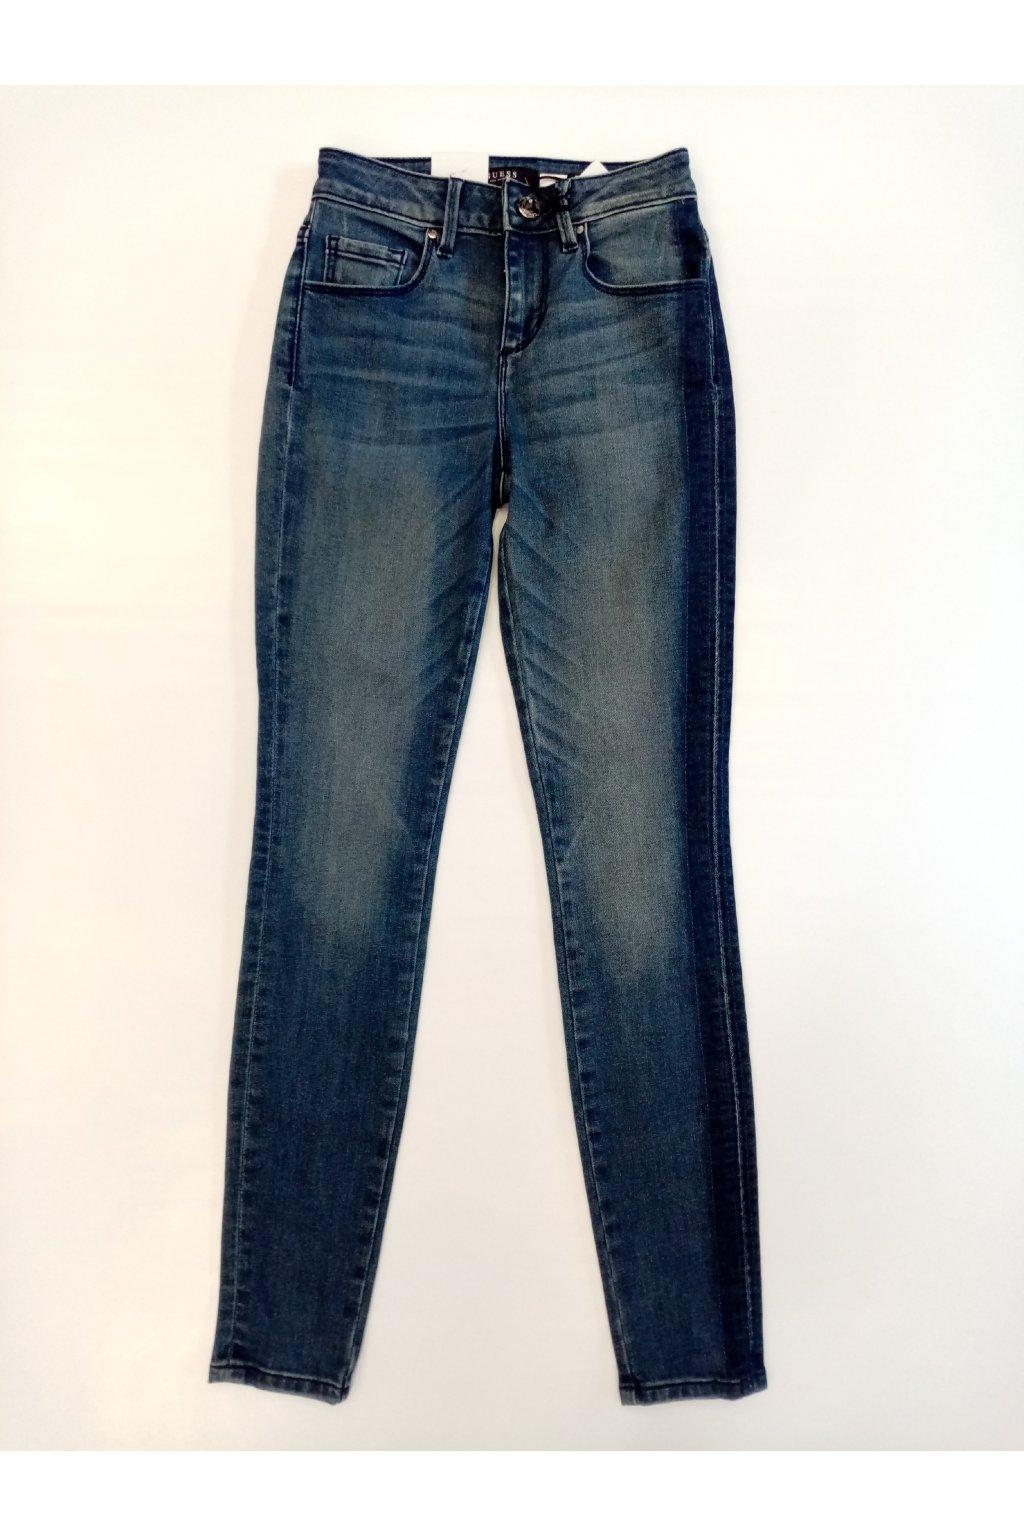 Kalhoty Guess B84A99D1SS1 - BSTP